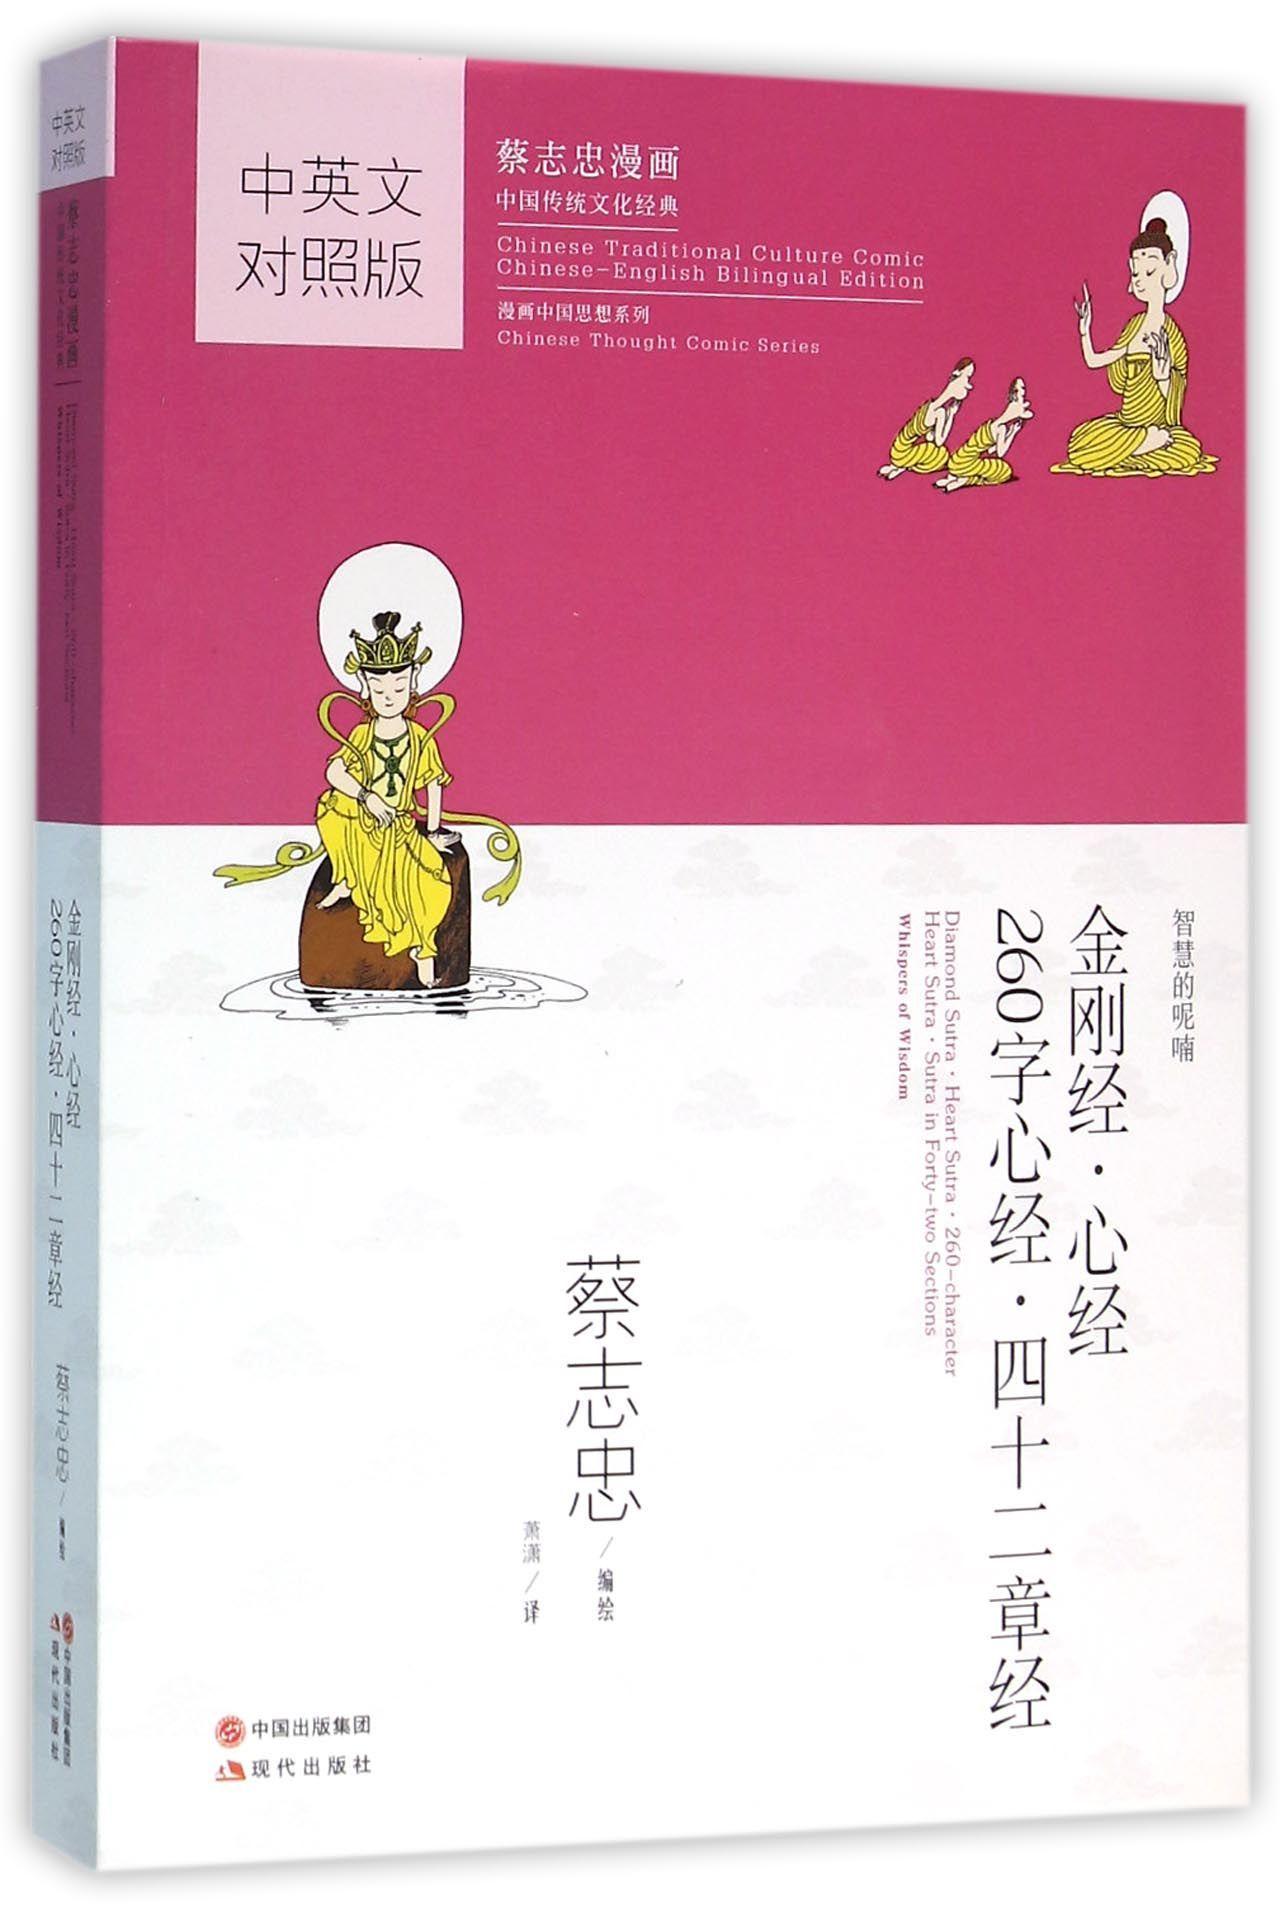 Diamond Sutra, Heart Sutra, Heart Sutra (260 Words), and Sutra of Forty-two Chapters (Tsai Chih Chung Comics in Both Chinese and English, Traditional Chinese Cultural Classics) 金刚经心经260字心经四十二章经(中英文对照版蔡志忠漫画中国传统文化经典)